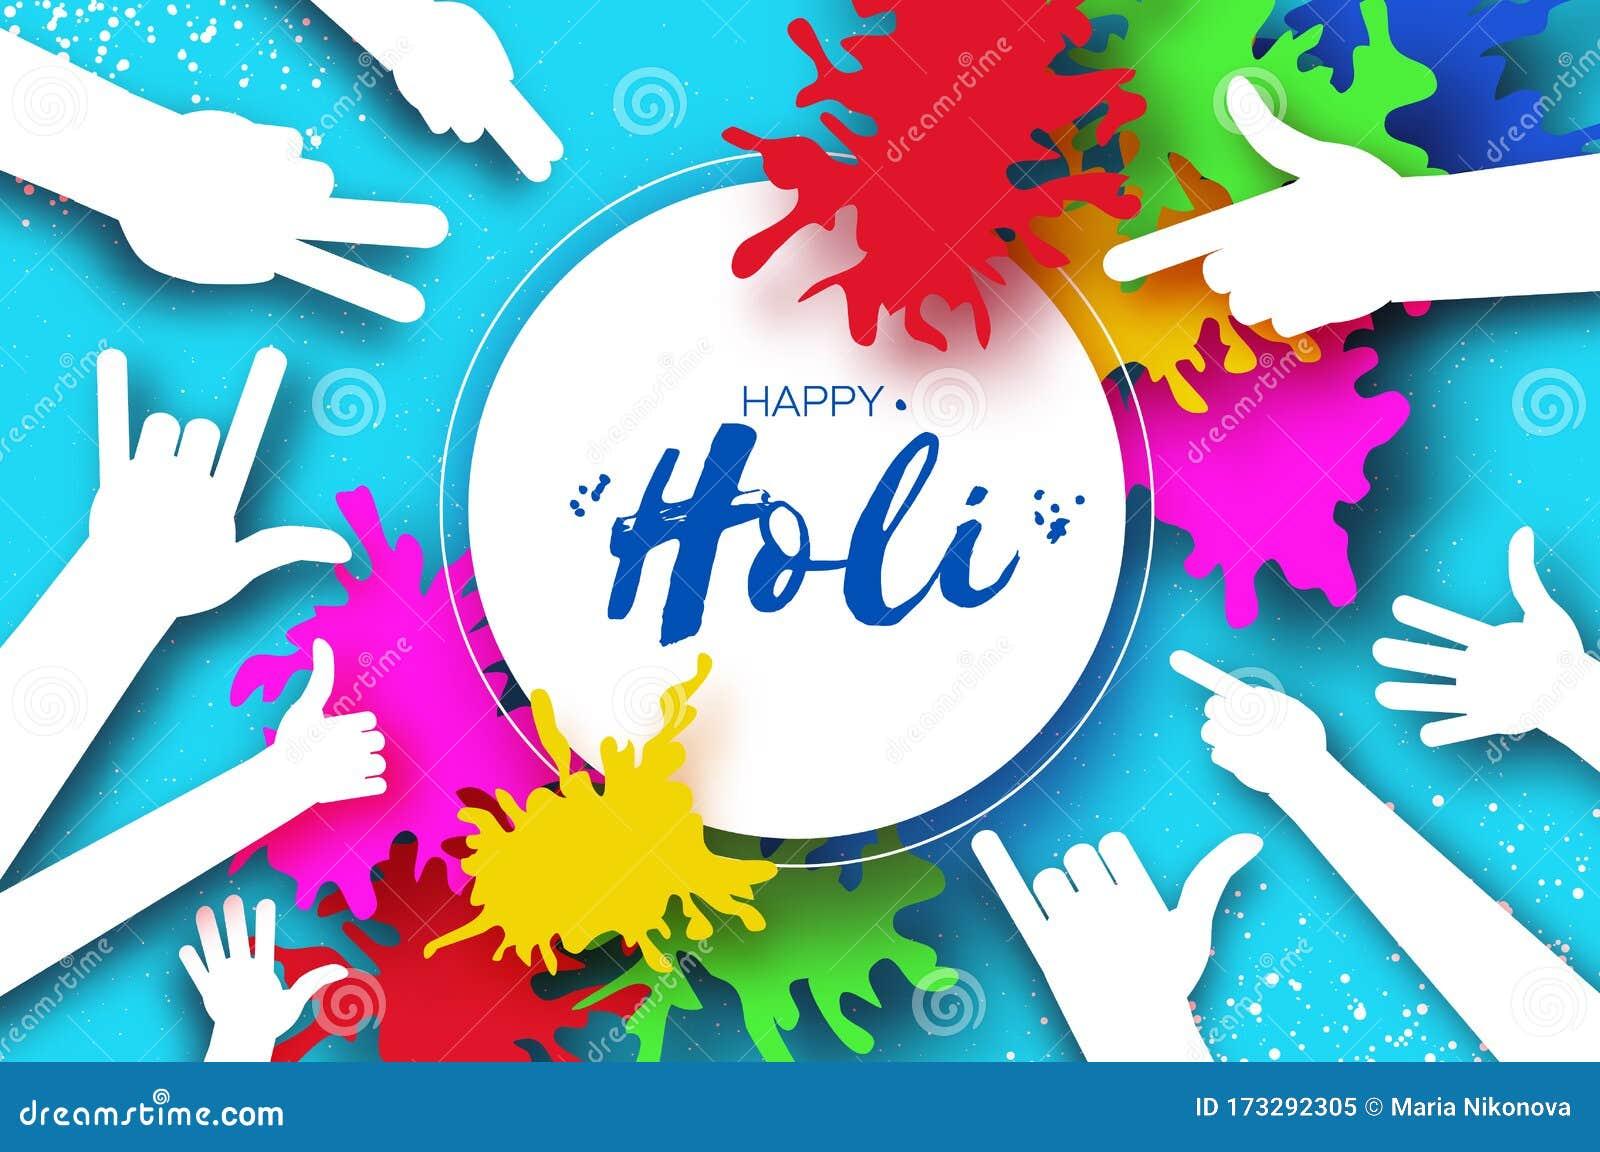 Happy Holi Festival Of Colors People Hands Colorful Splash Paint